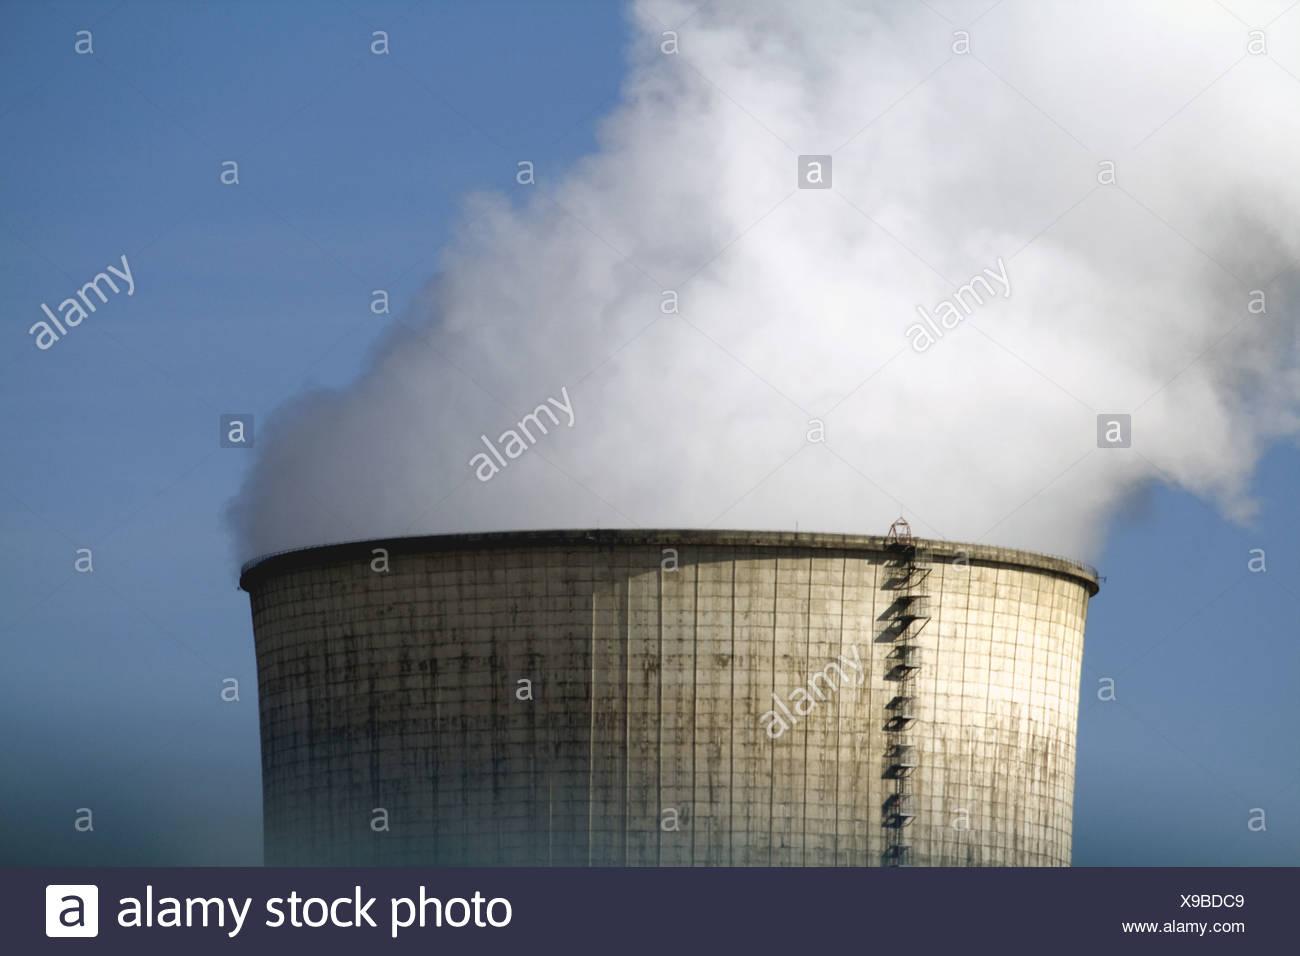 Atomic Power Plant, Cattenom, France - Stock Image